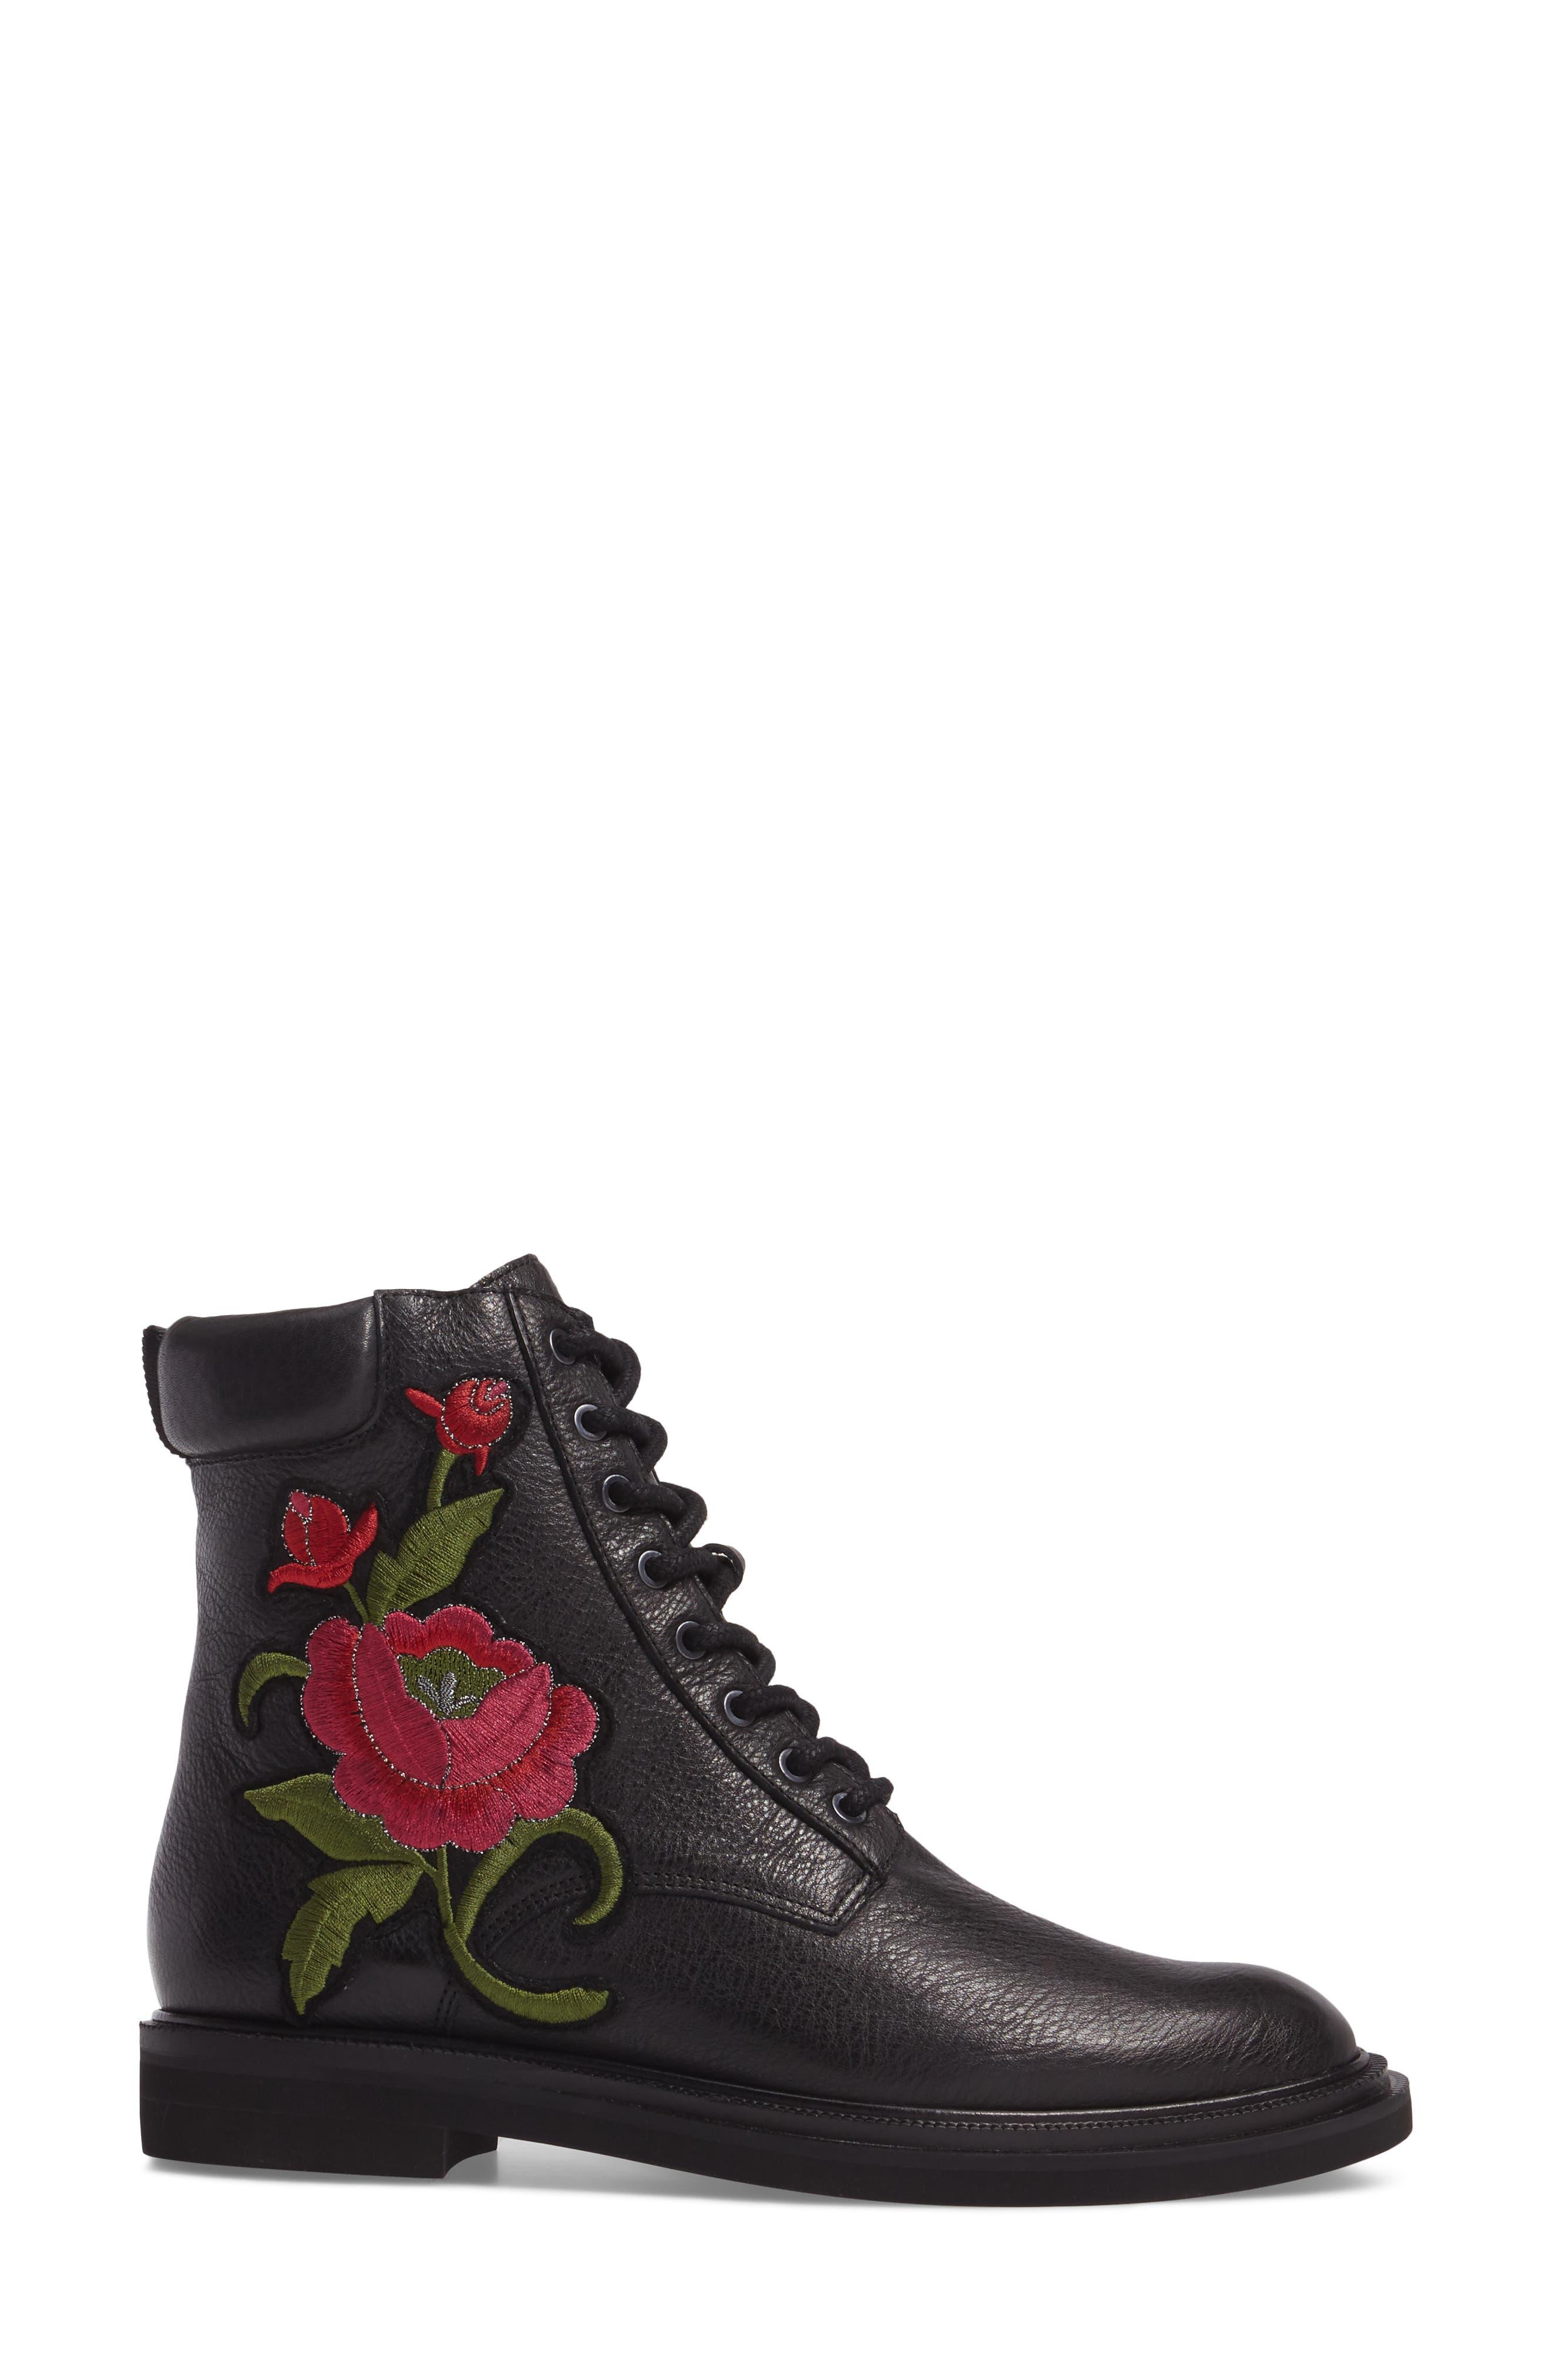 Ashton 2 Embroidered Boot,                             Alternate thumbnail 3, color,                             001